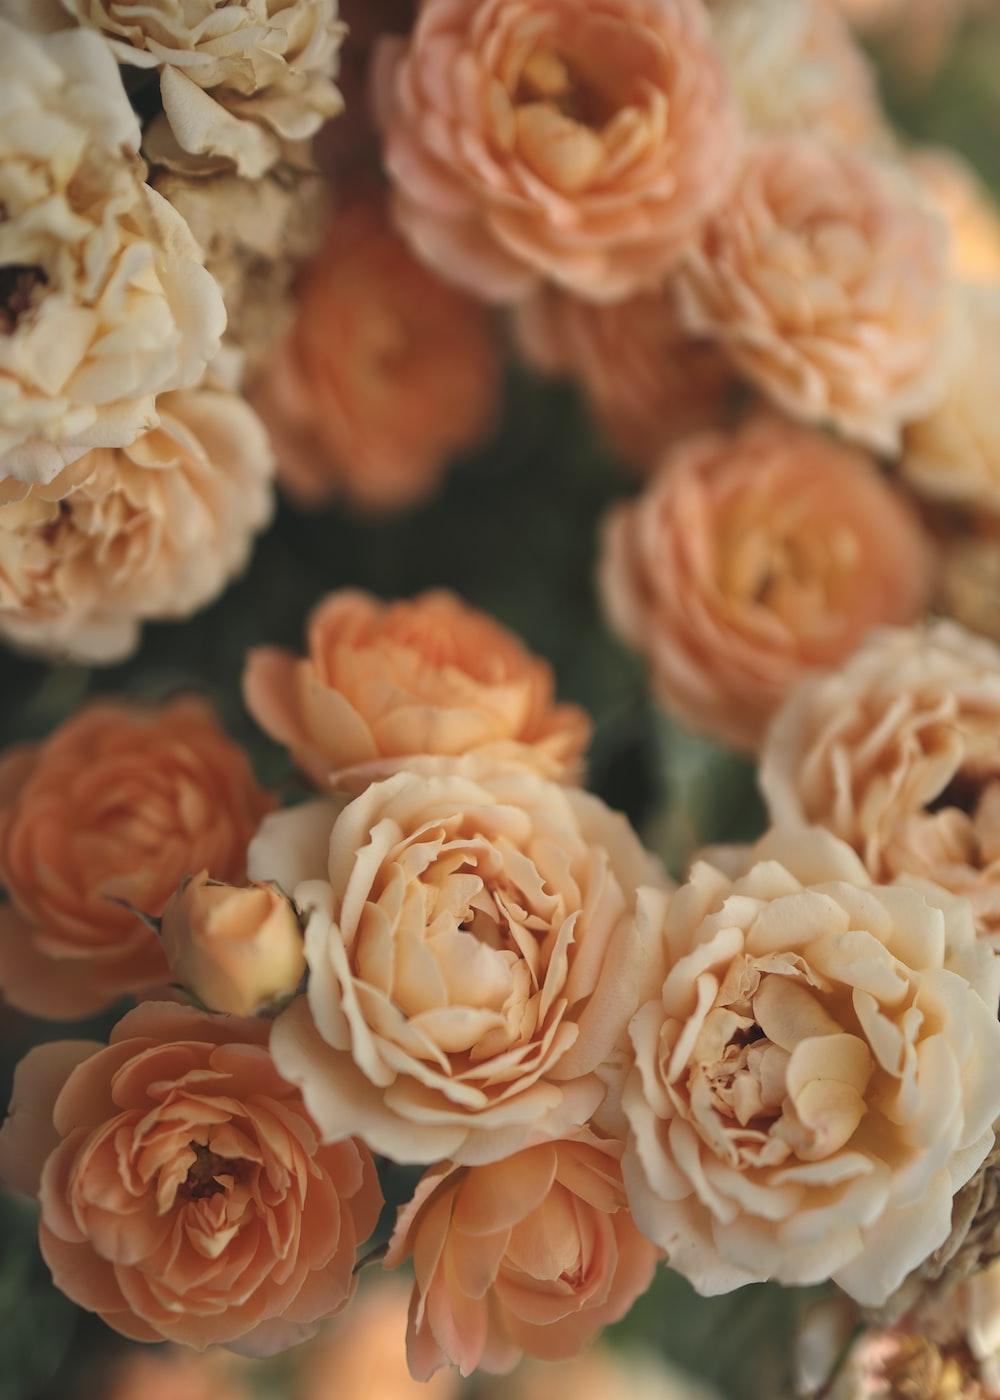 orange and white flower petals